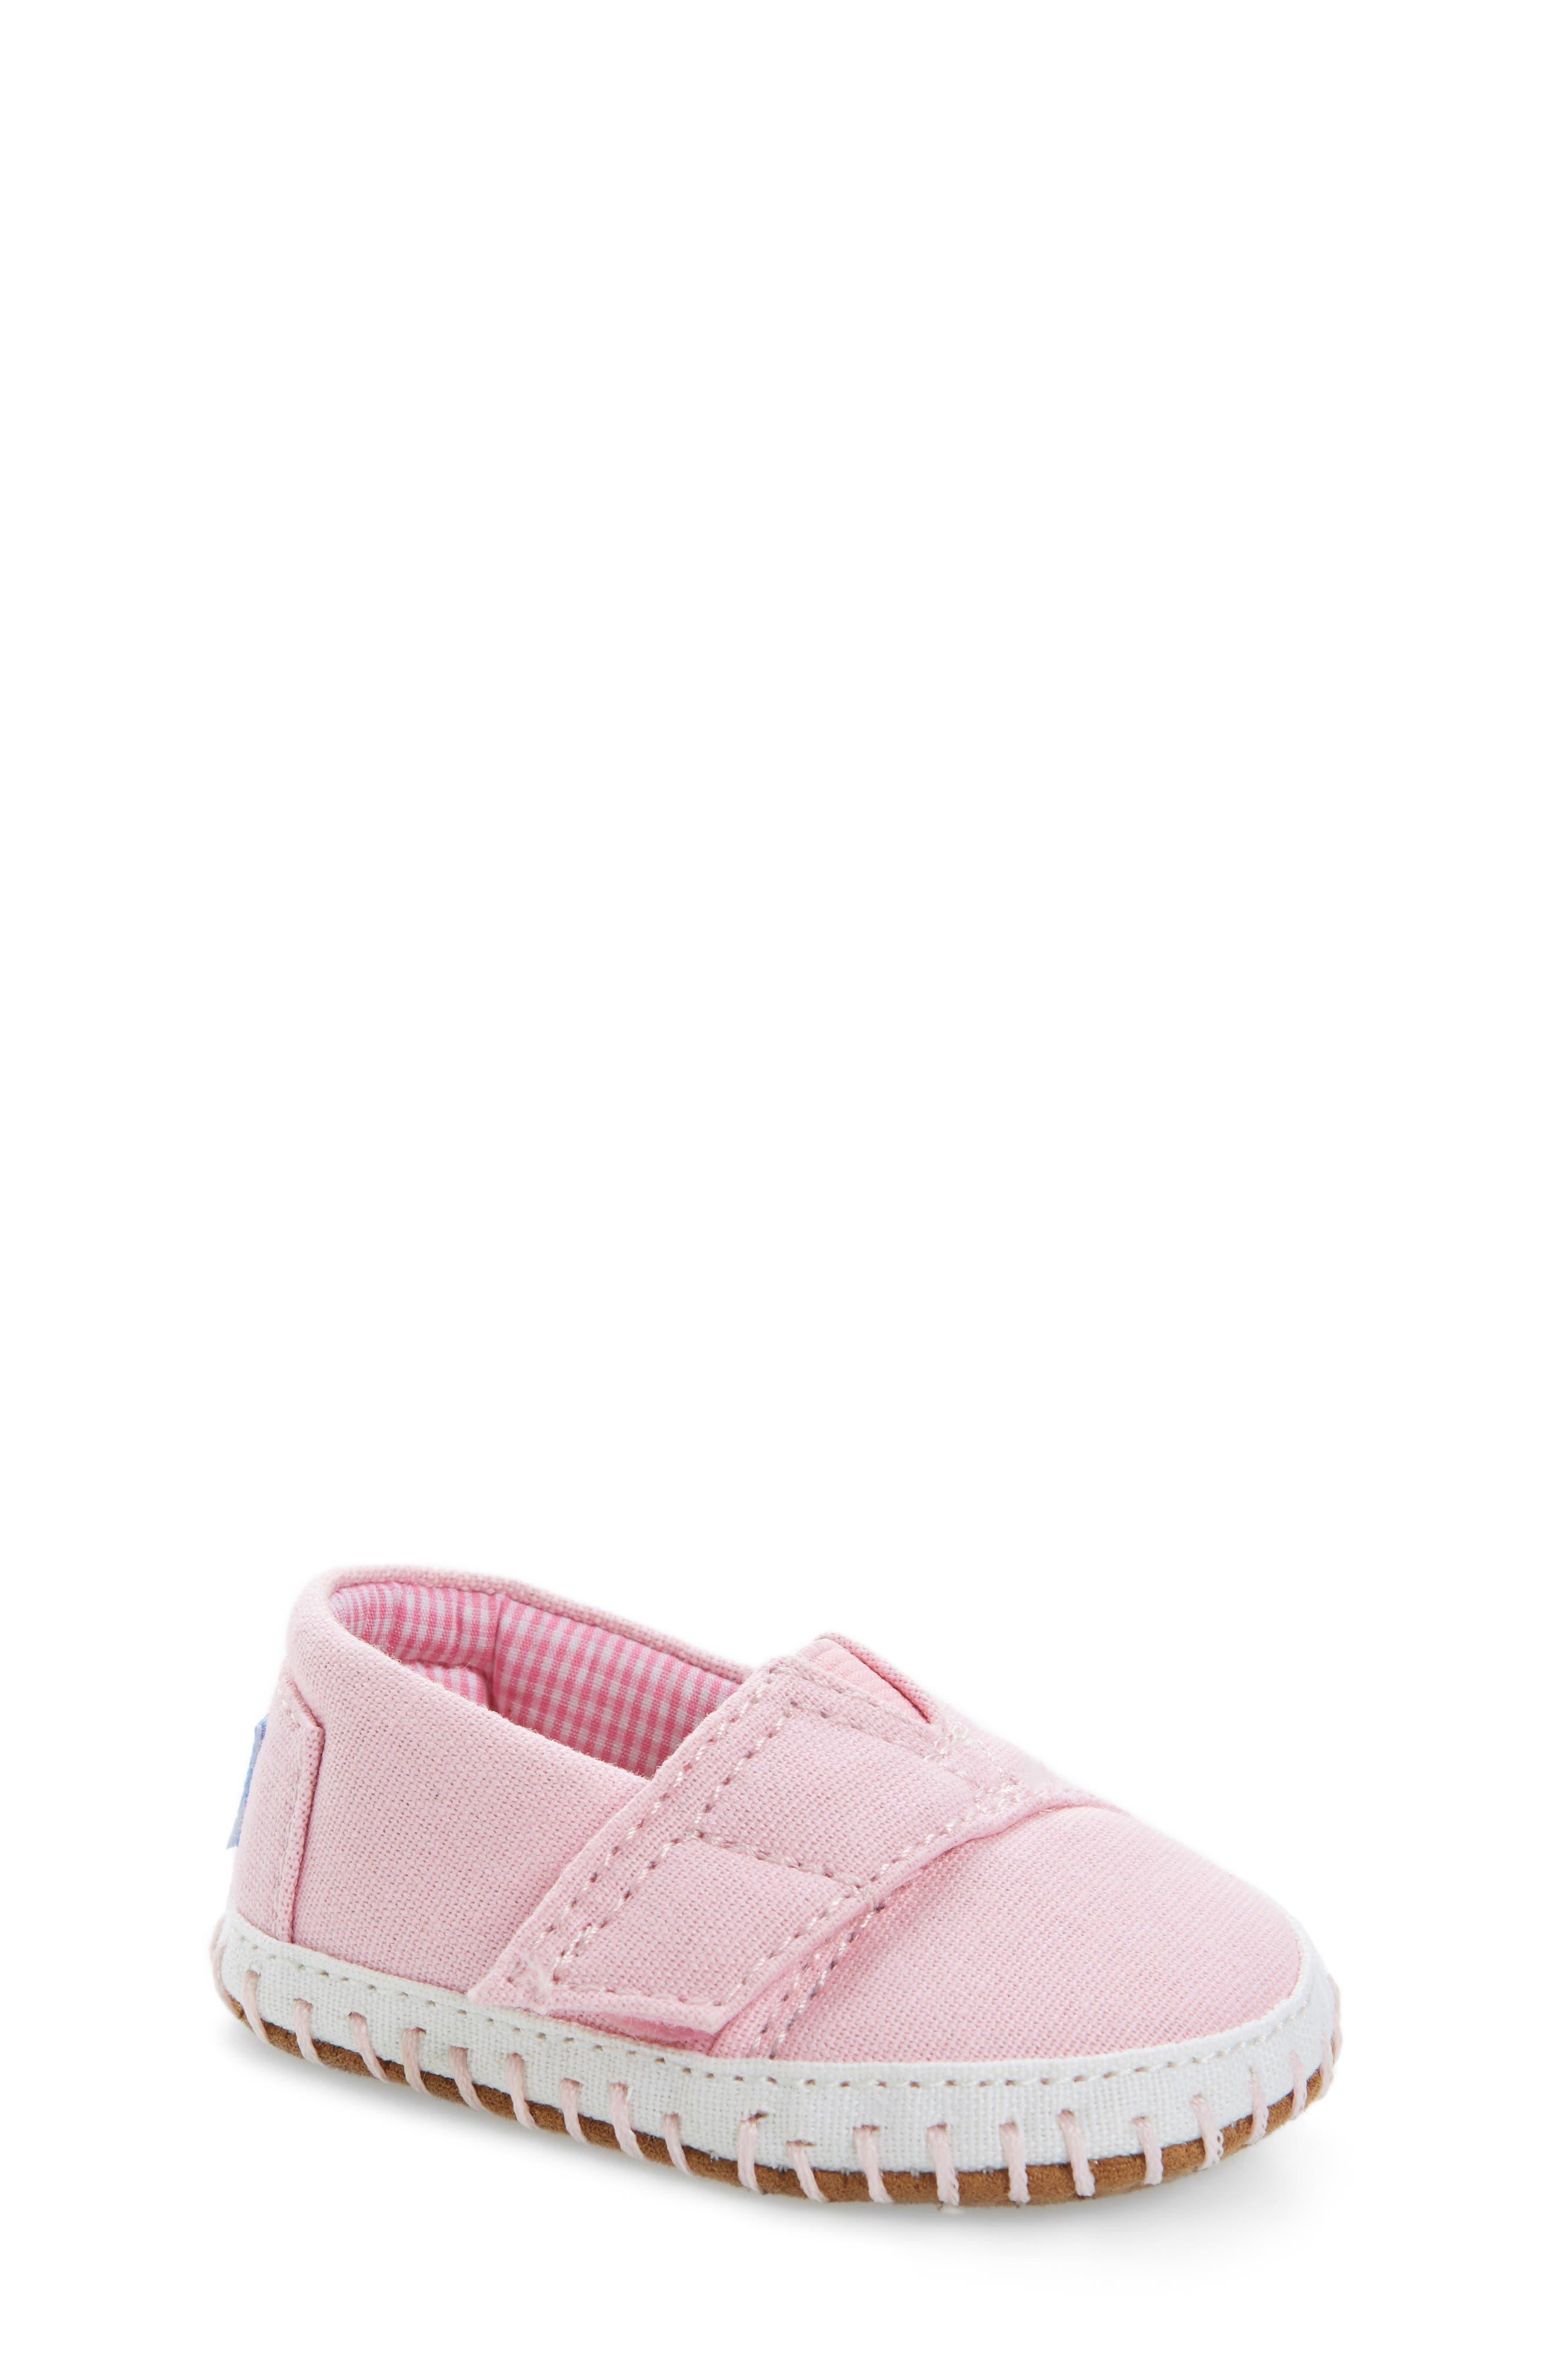 spade shoe baby crib champion image toms keds pin main shoes glitter kate york cribs new x